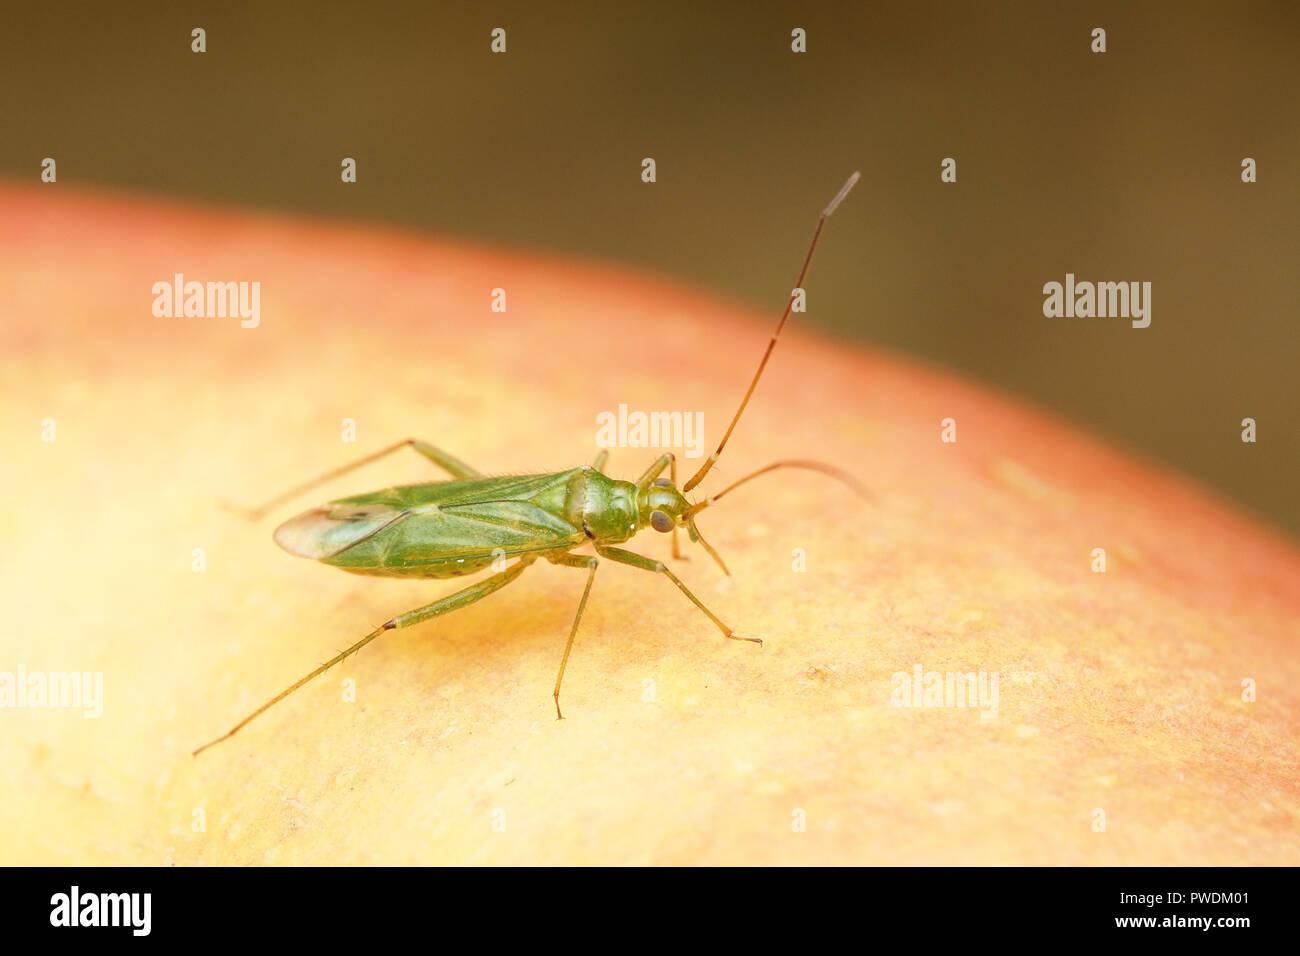 Capsid or mirid bug (Blepharidopterus angulatus) on an apple. Tipperary, Ireland - Stock Image